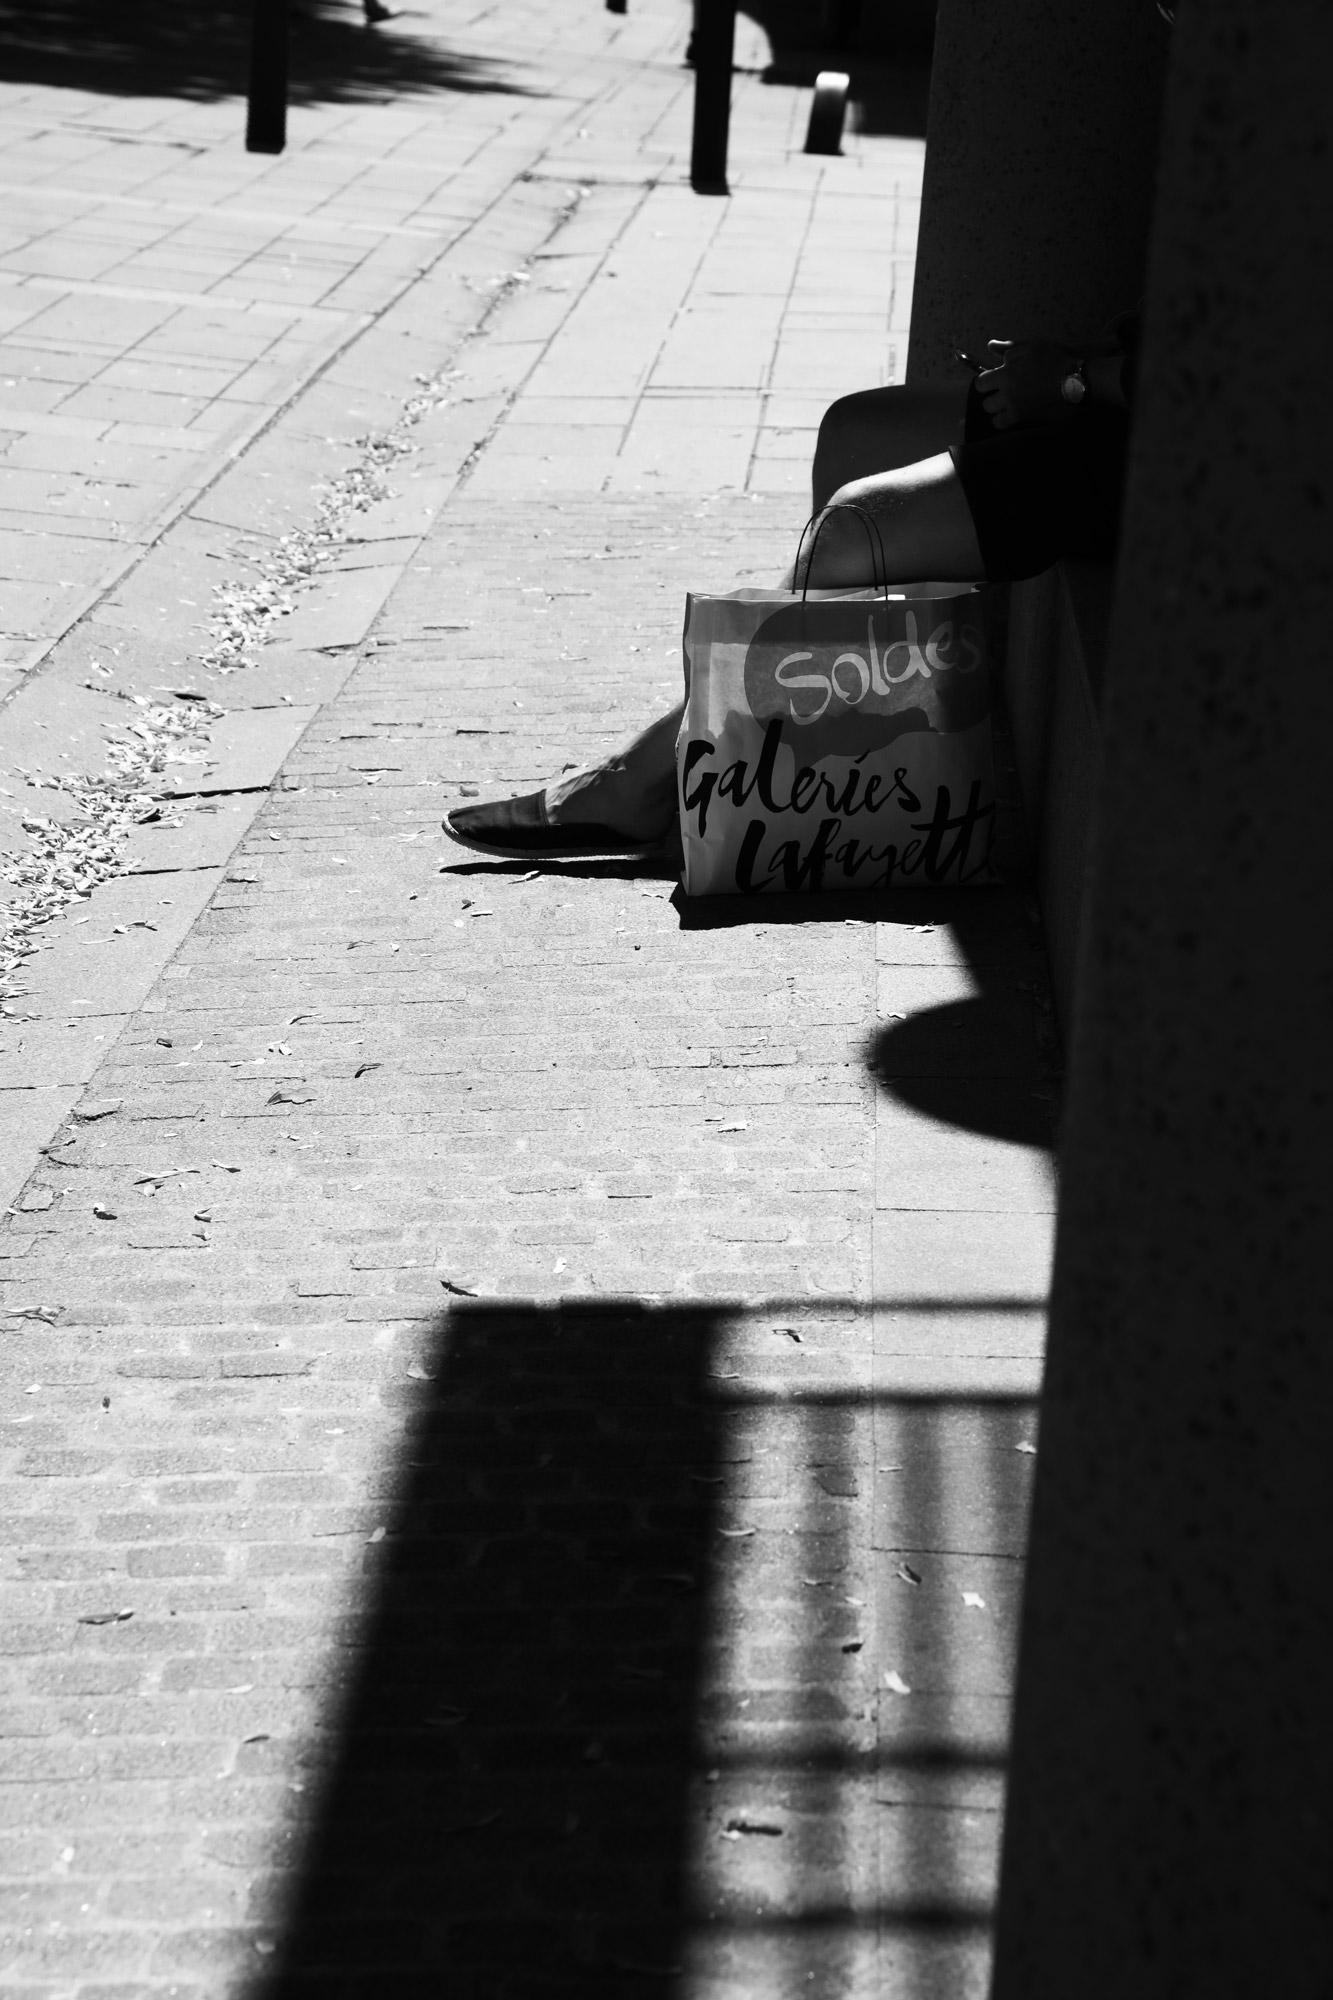 """Feet on sale"" - Allée des Tanneurs, Nantes. ©Clémence Rougetet"